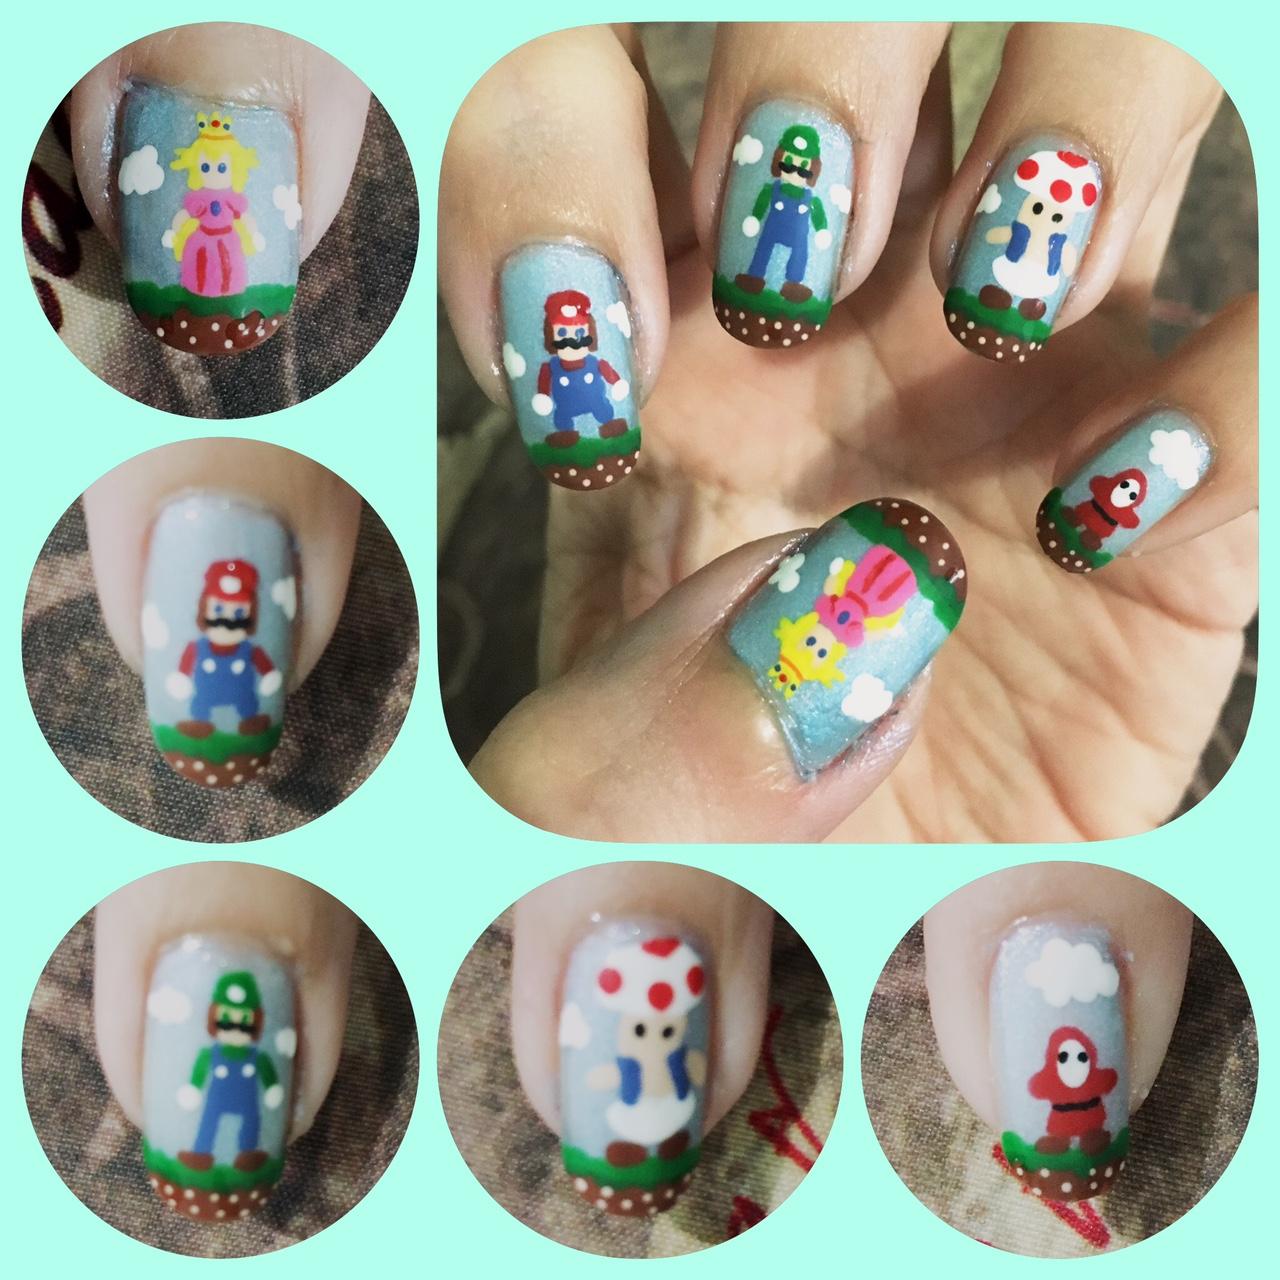 Mario 2 nail art left by AzureMikari